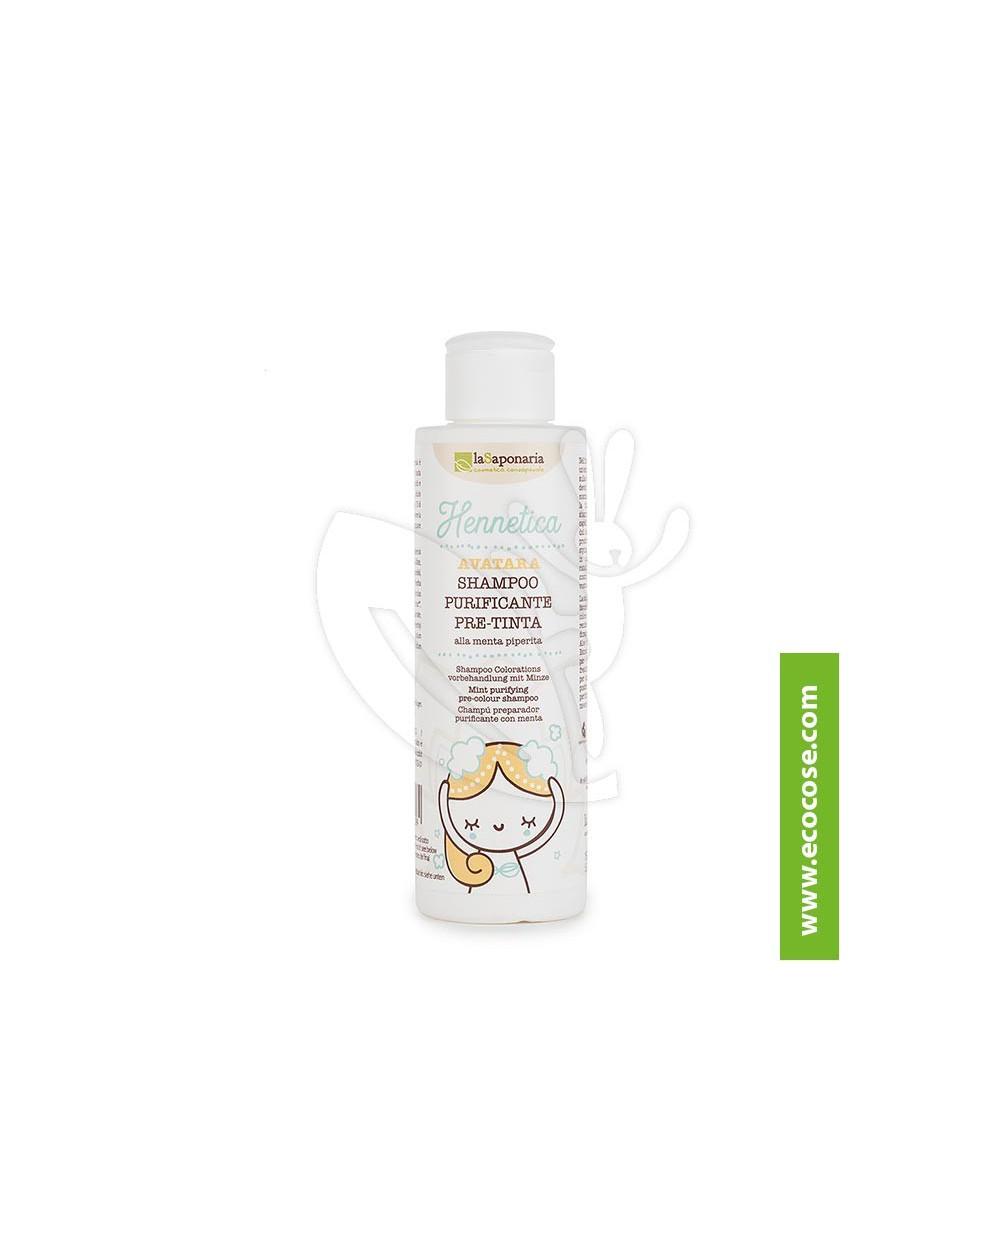 La Saponaria - Hennetica - Shampoo pre-tinta Avatara